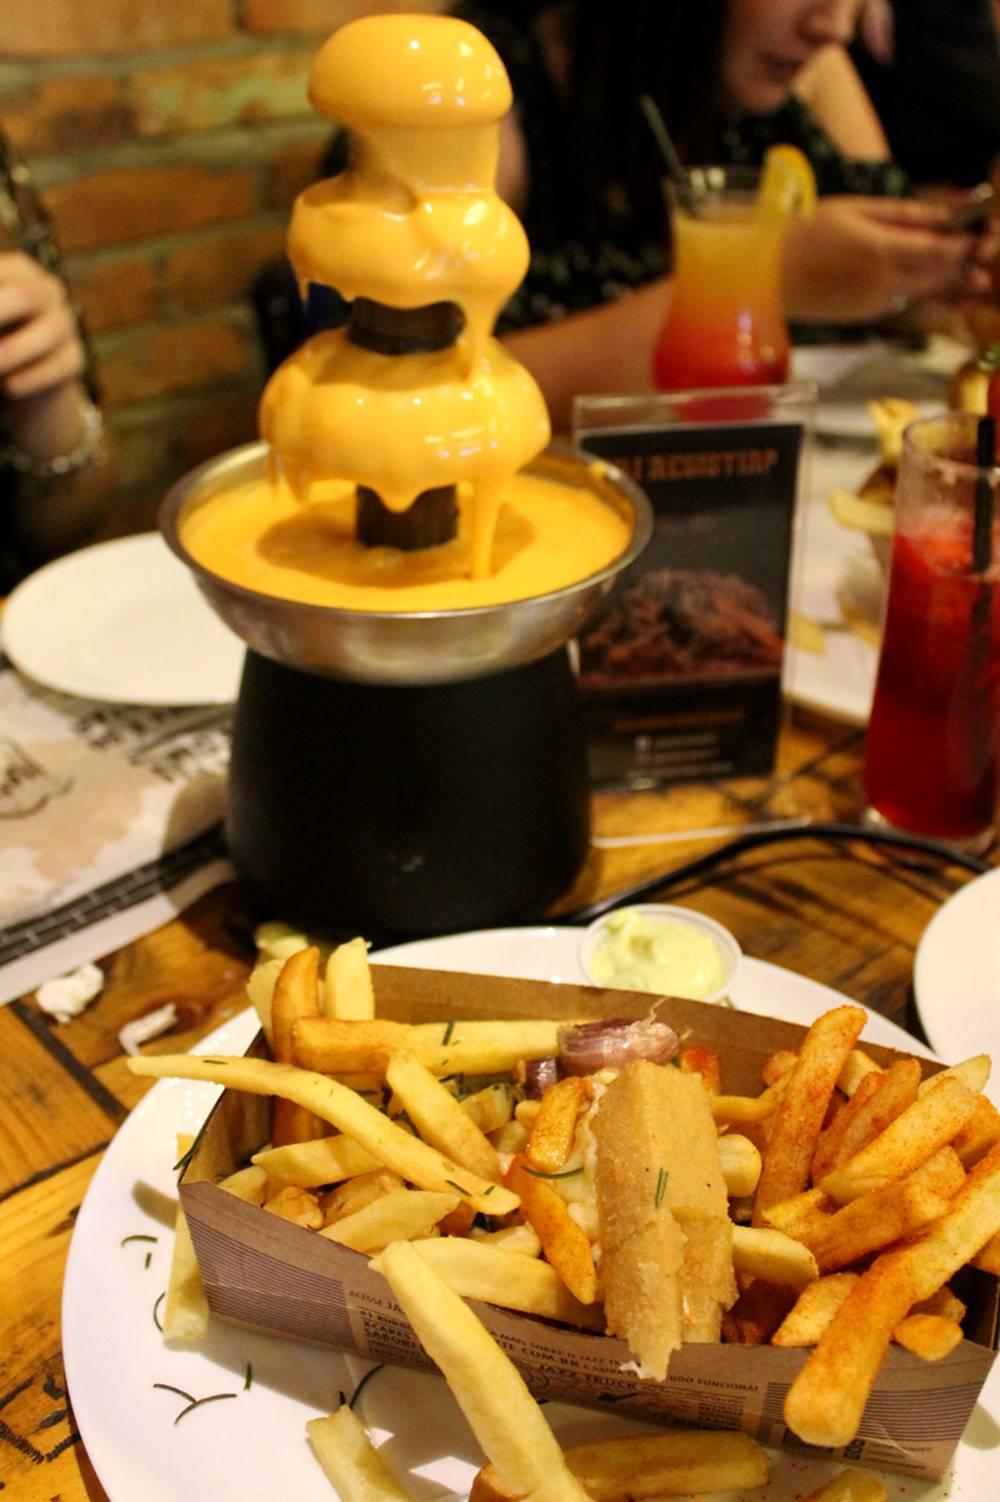 Torre de cheddar do Jazz Restô Burguers parceiro #Bloggerssecret